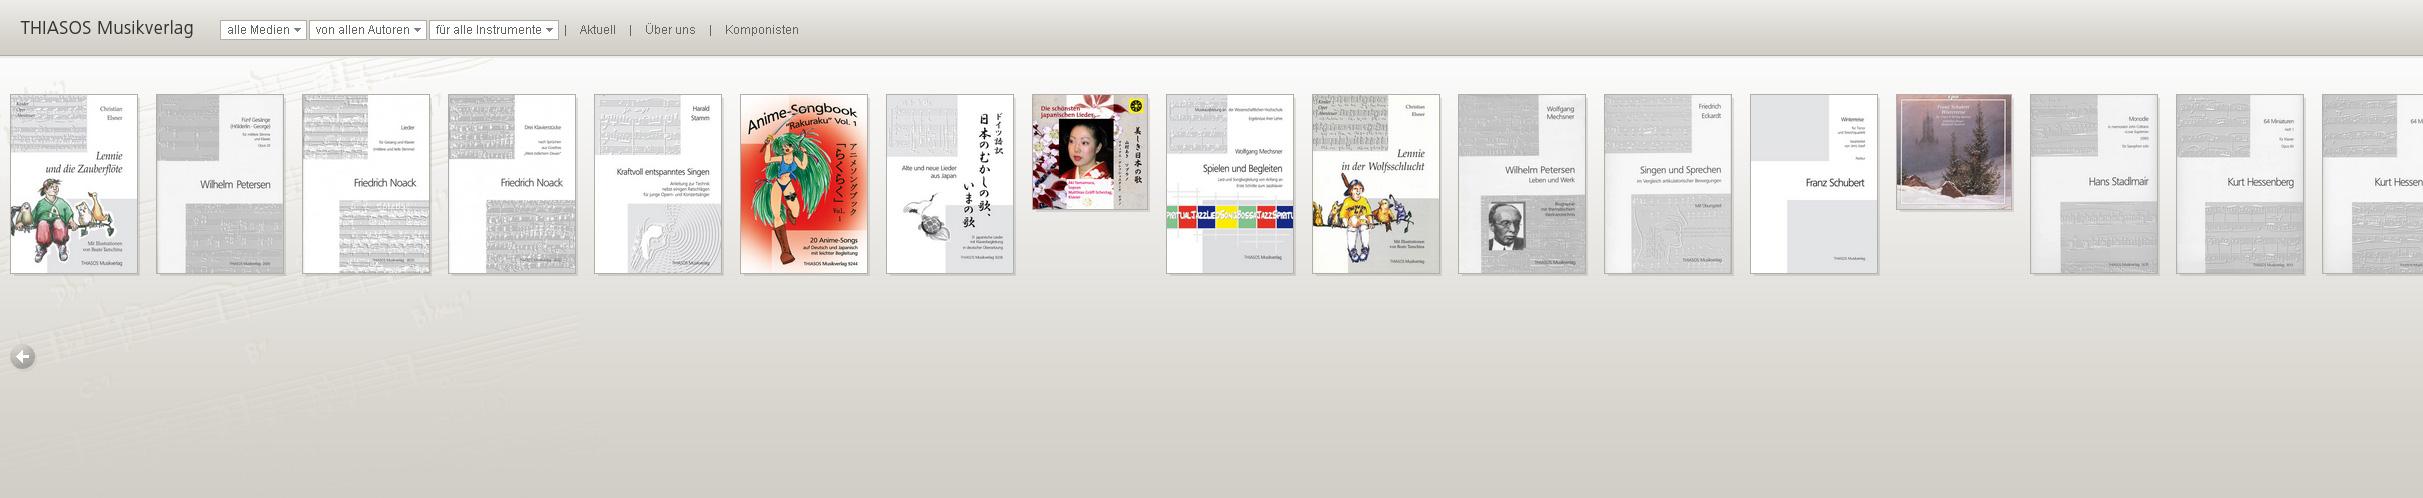 Thiasos.de. WebShop für den Thiasos Musikverlag. Umgesetzt mit Easy-Cart.